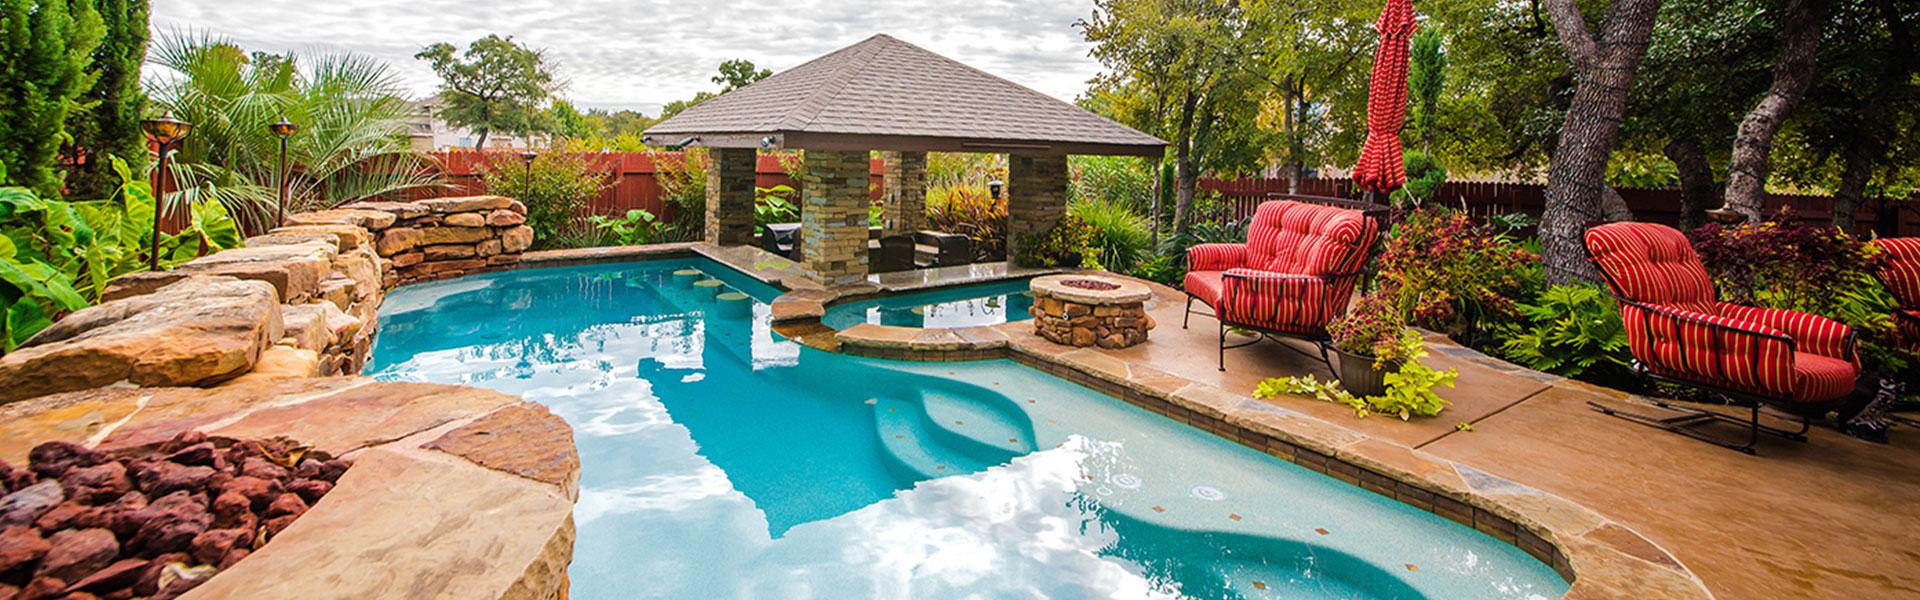 Sprinkler system san antonio drip irrigation pools texas